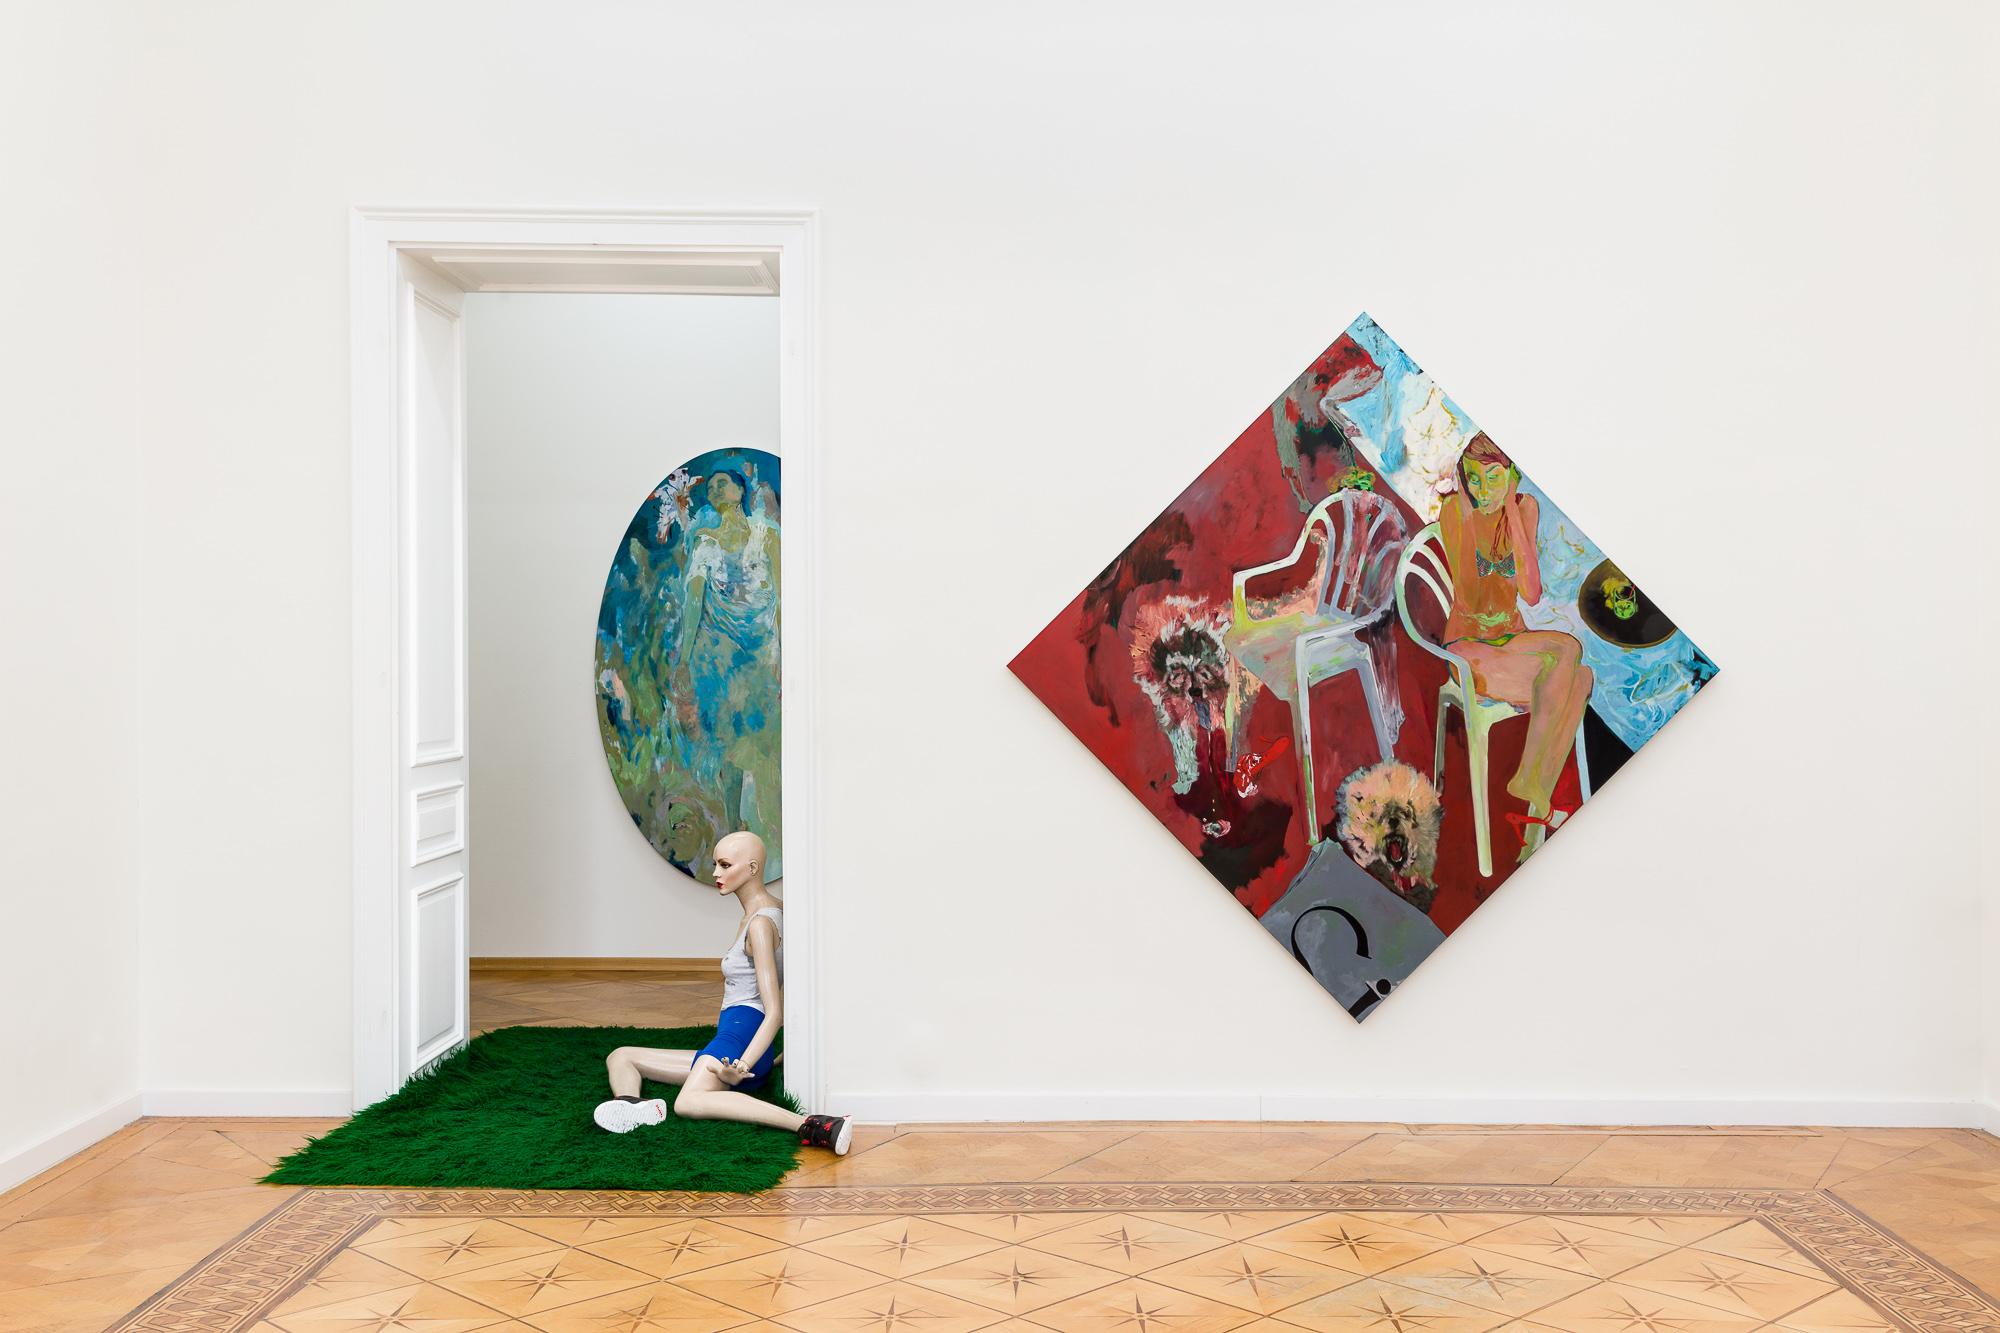 2019_01_28_Georgia Gardner Gray at Croy Nielsen by Kunstdokumentationcom_v2_002_web.jpg